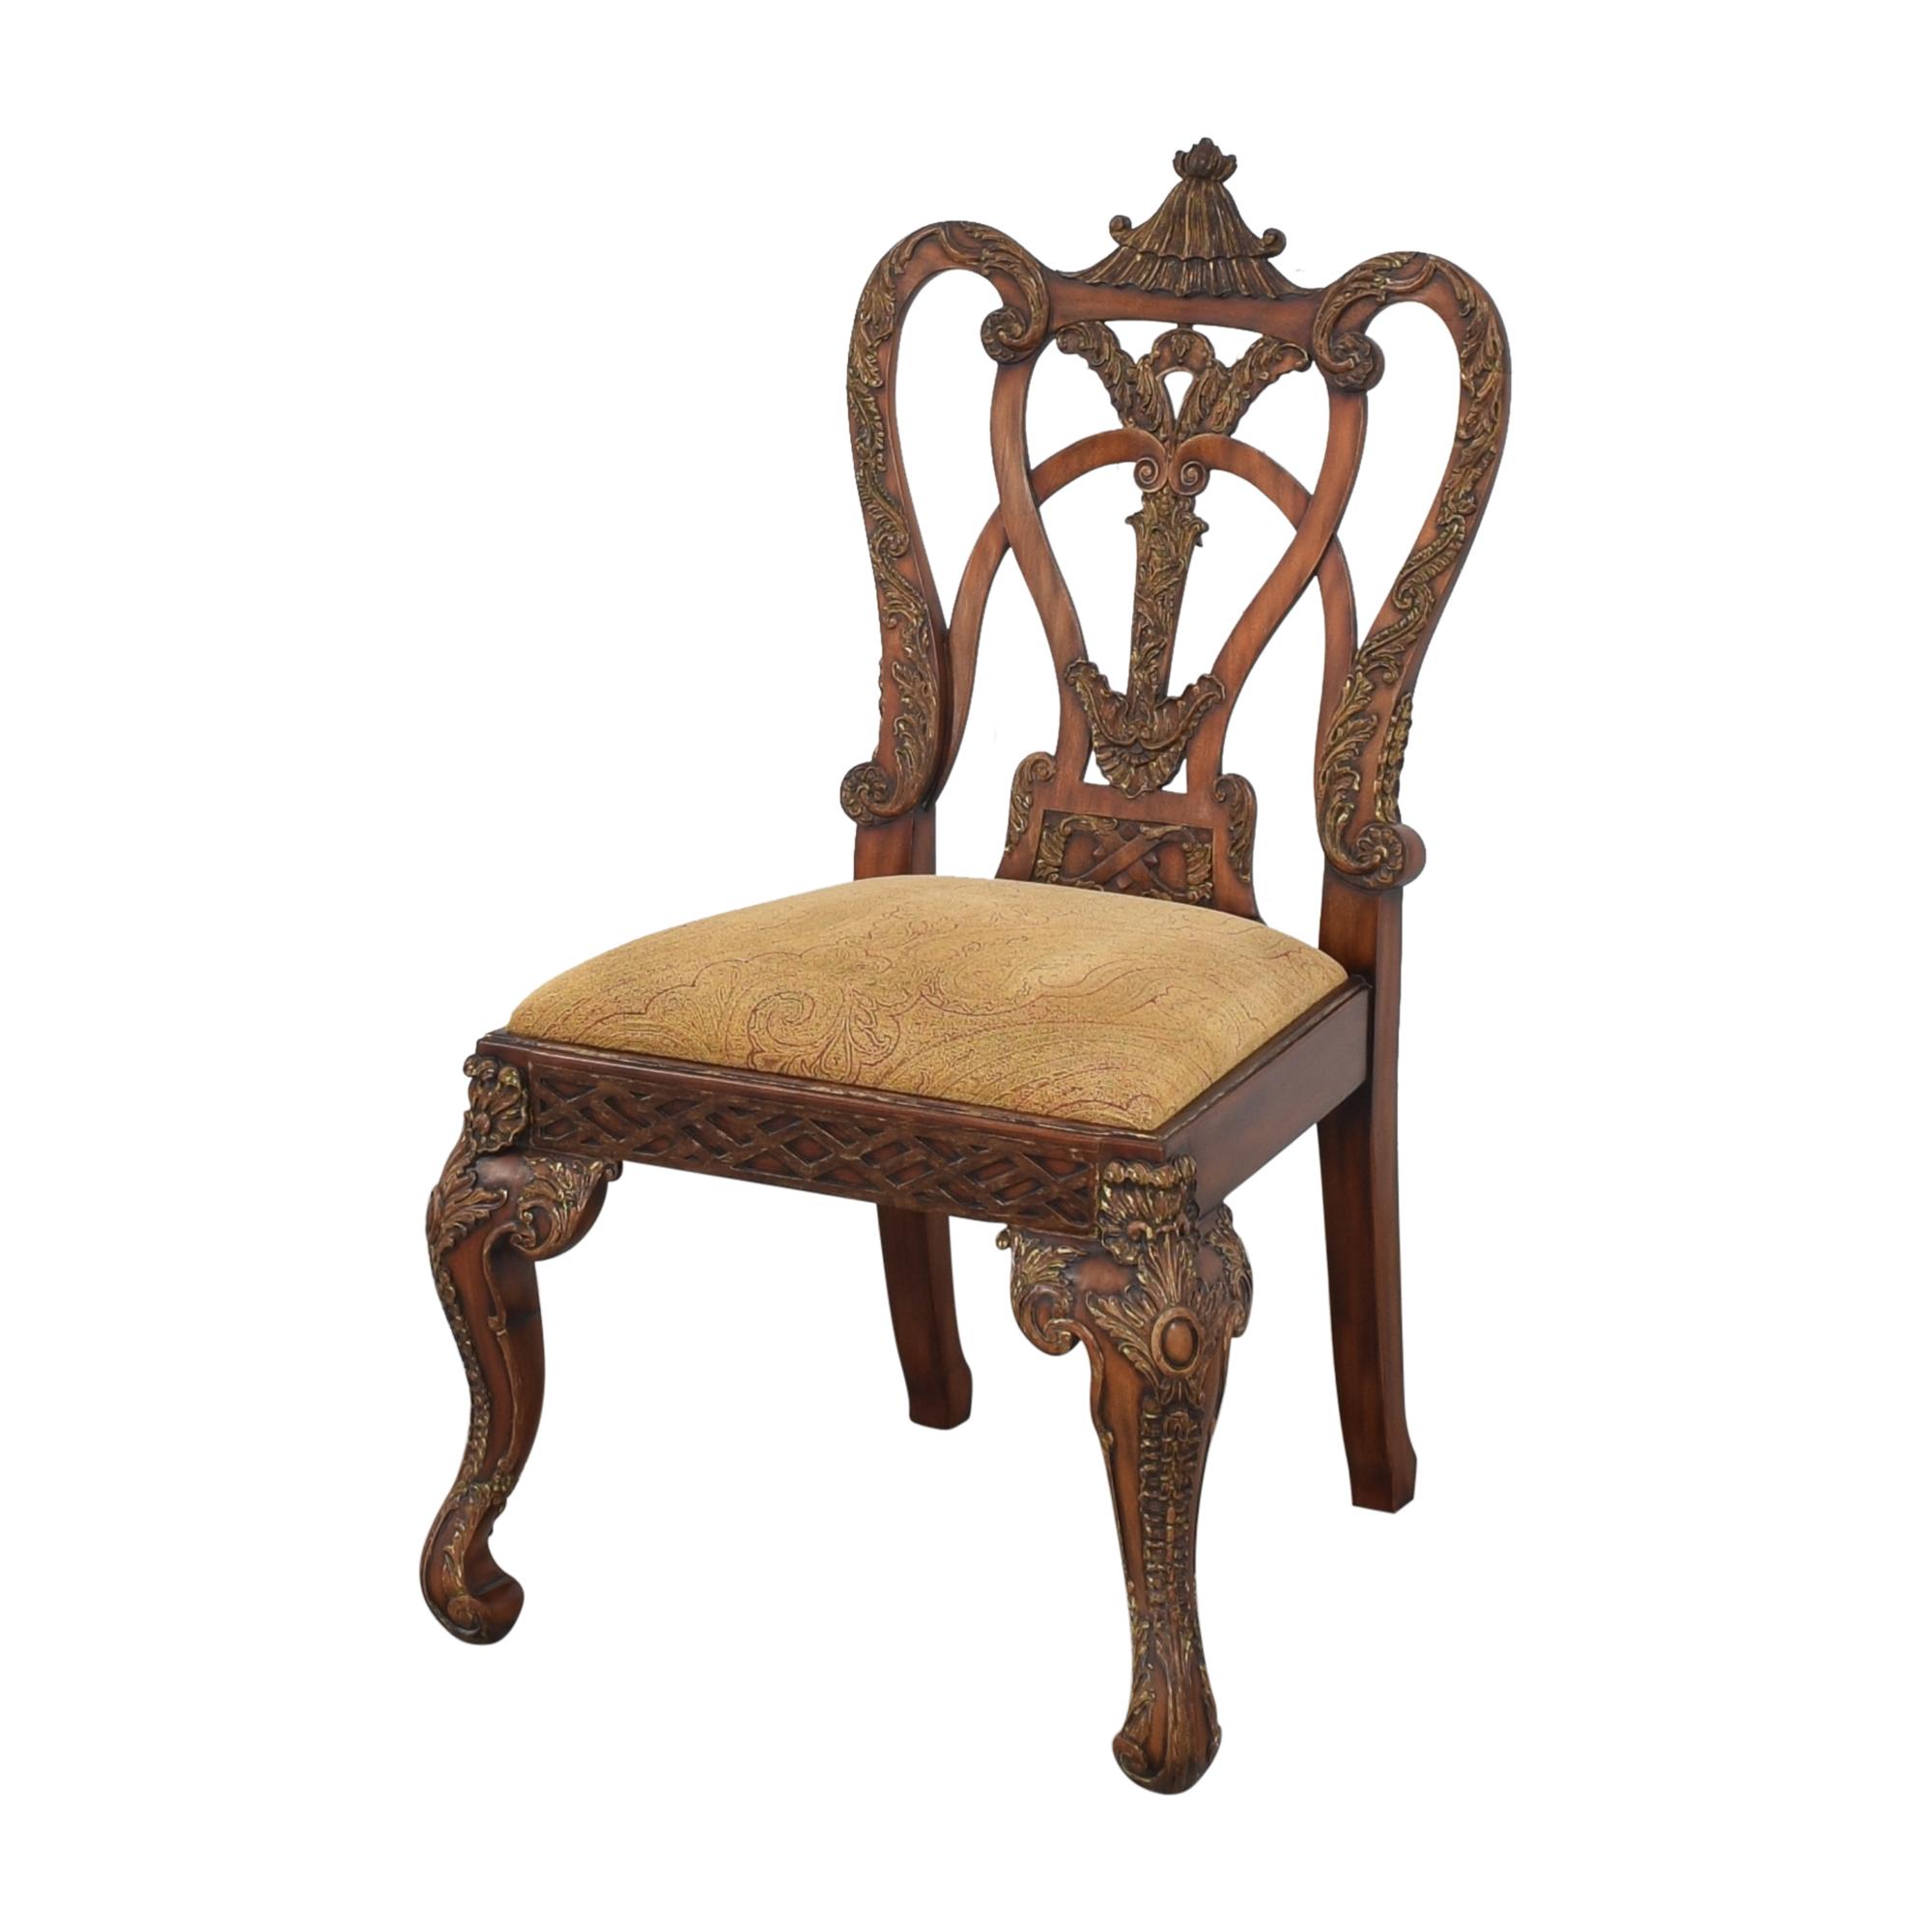 buy Maitland-Smith Maitland-Smith Decorative Dining Chair online